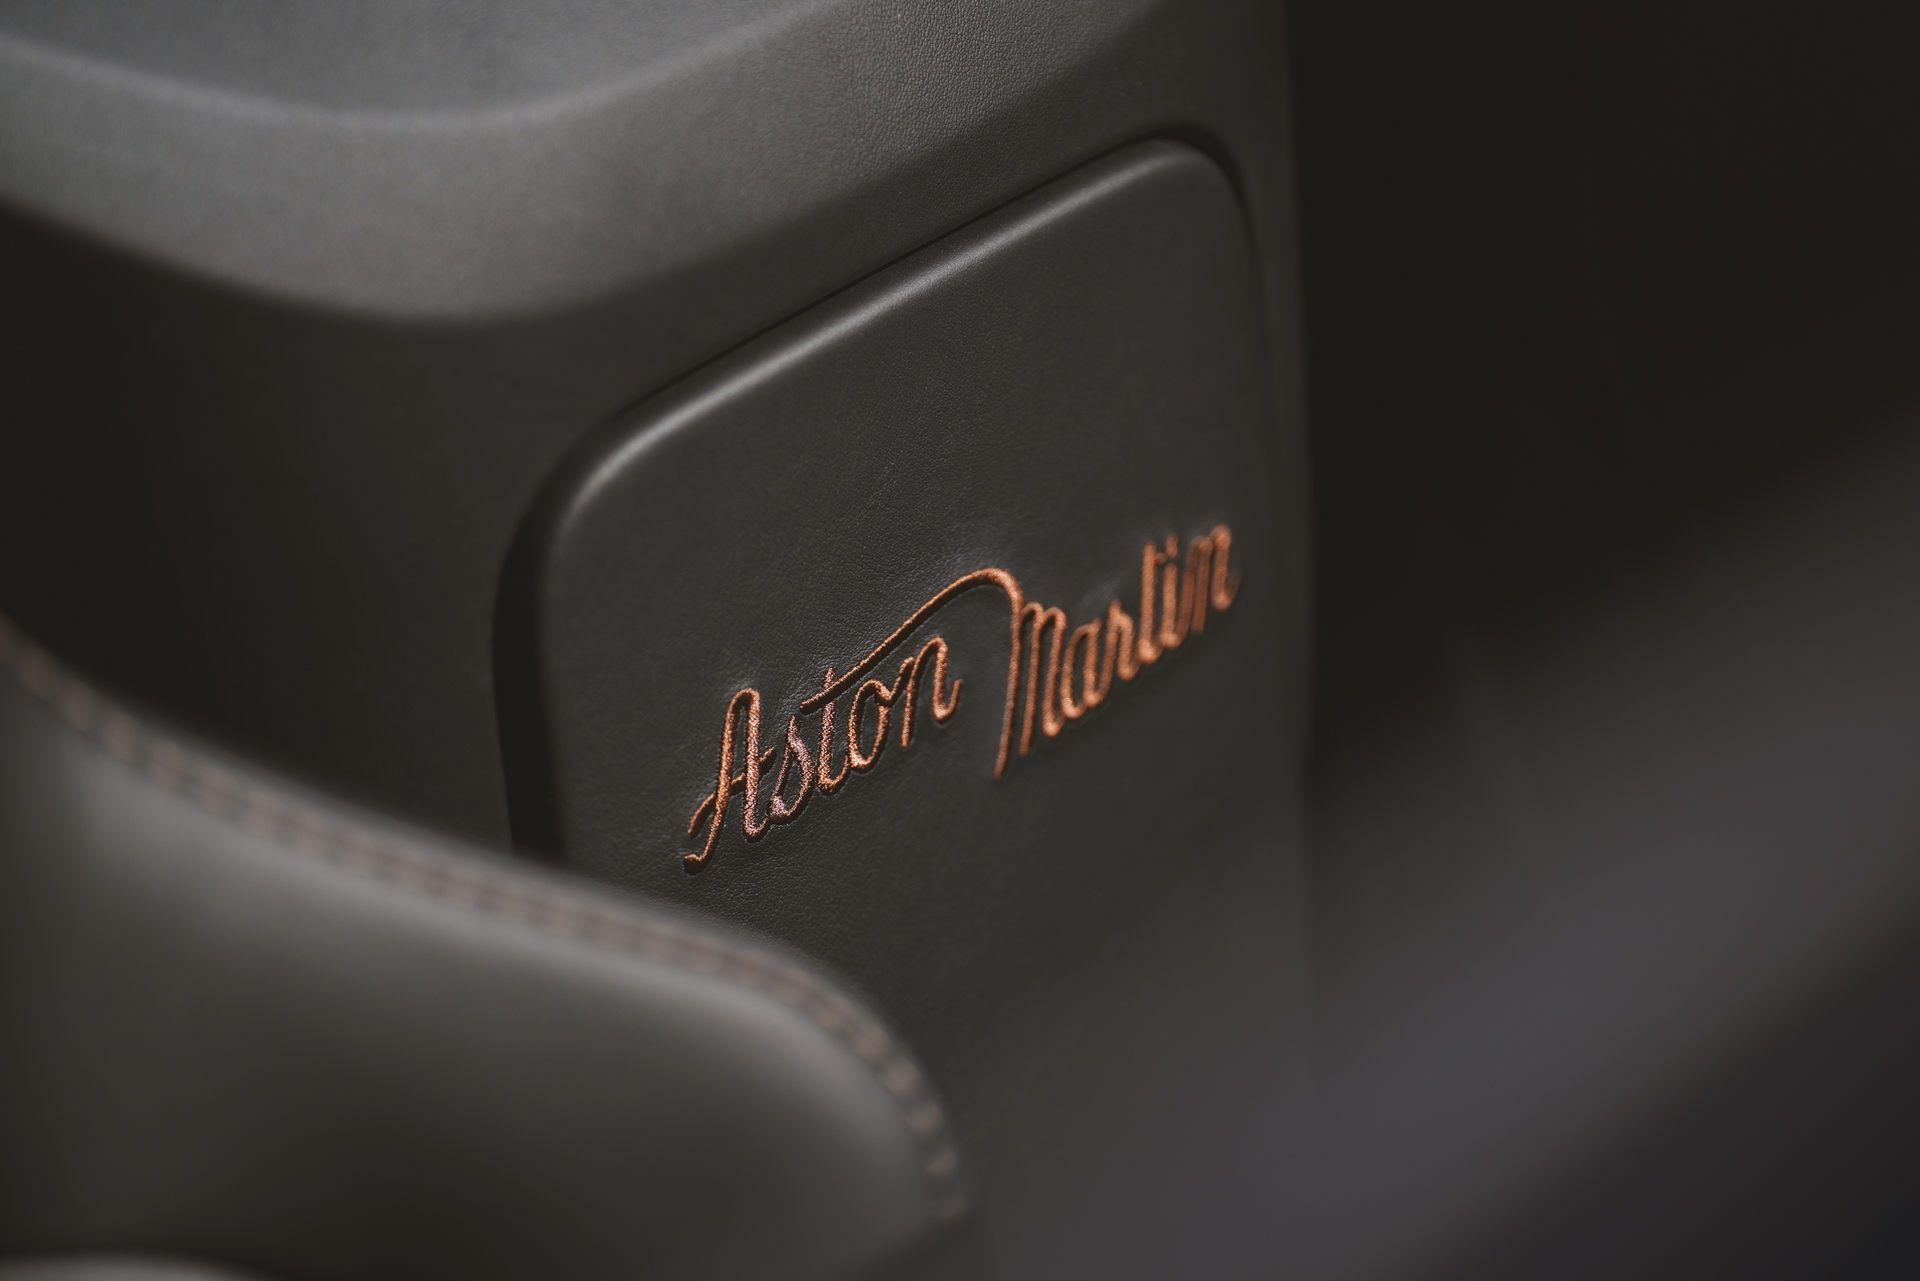 Aston-Martin-Vantage-Roadster-A3-16